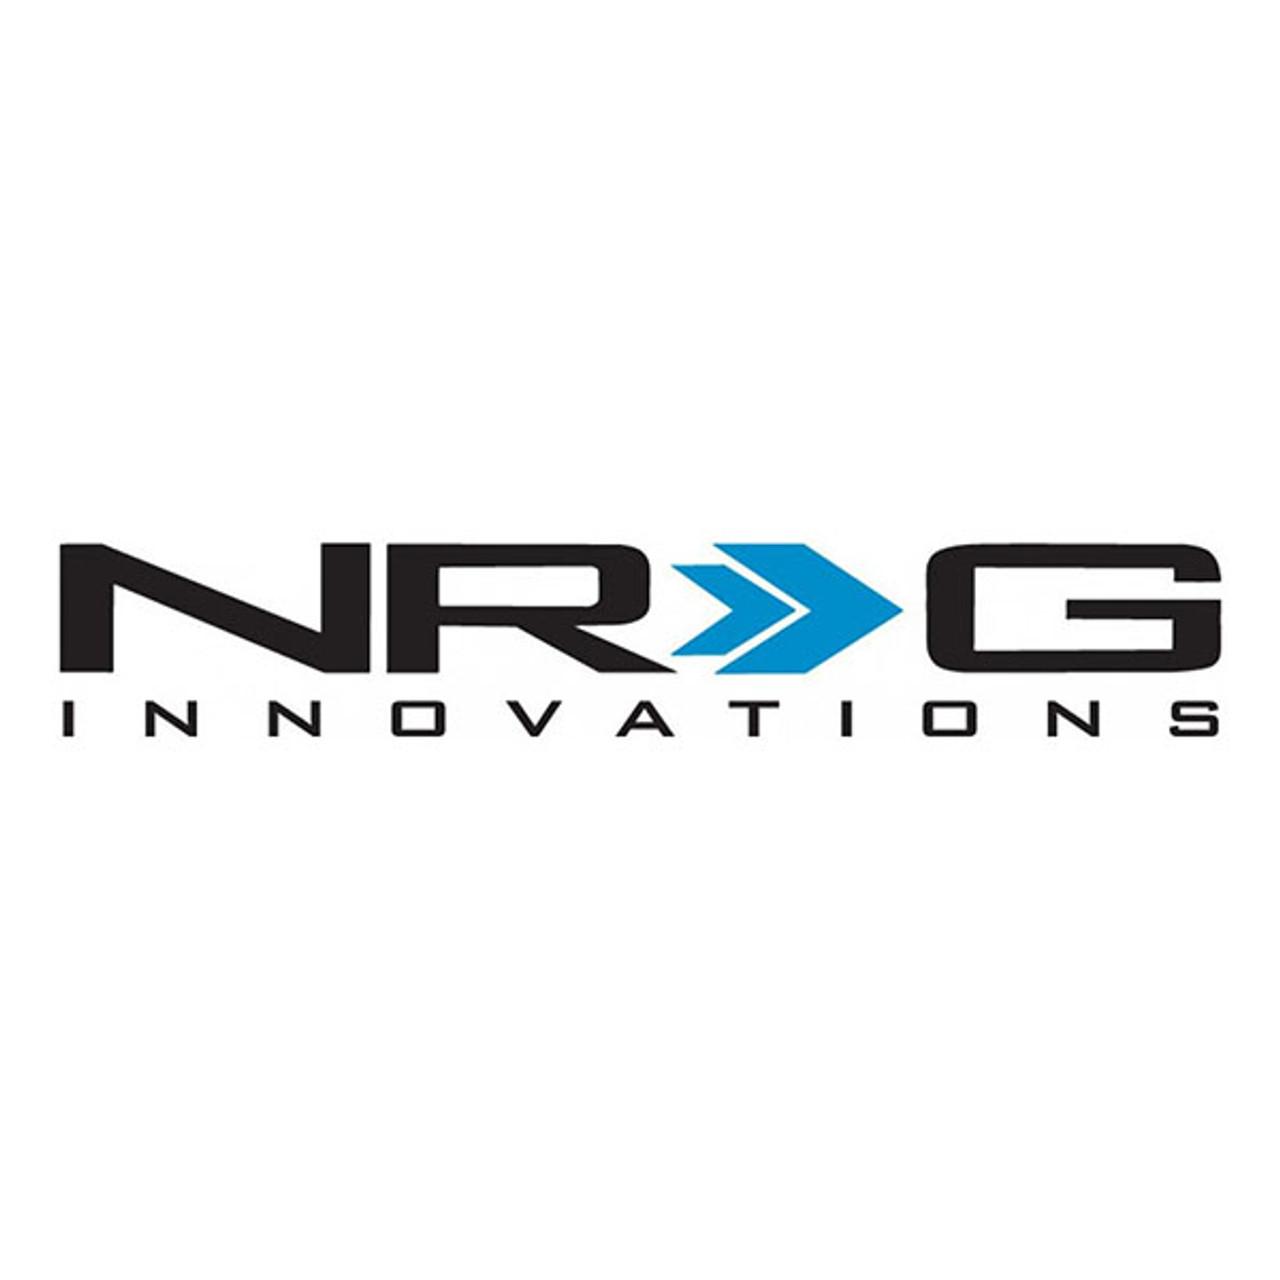 NRG (SRK-131H) STEERING WHEEL HUB, INSTALL ADAPTER, HONDA CIVIC SI (2006-11)